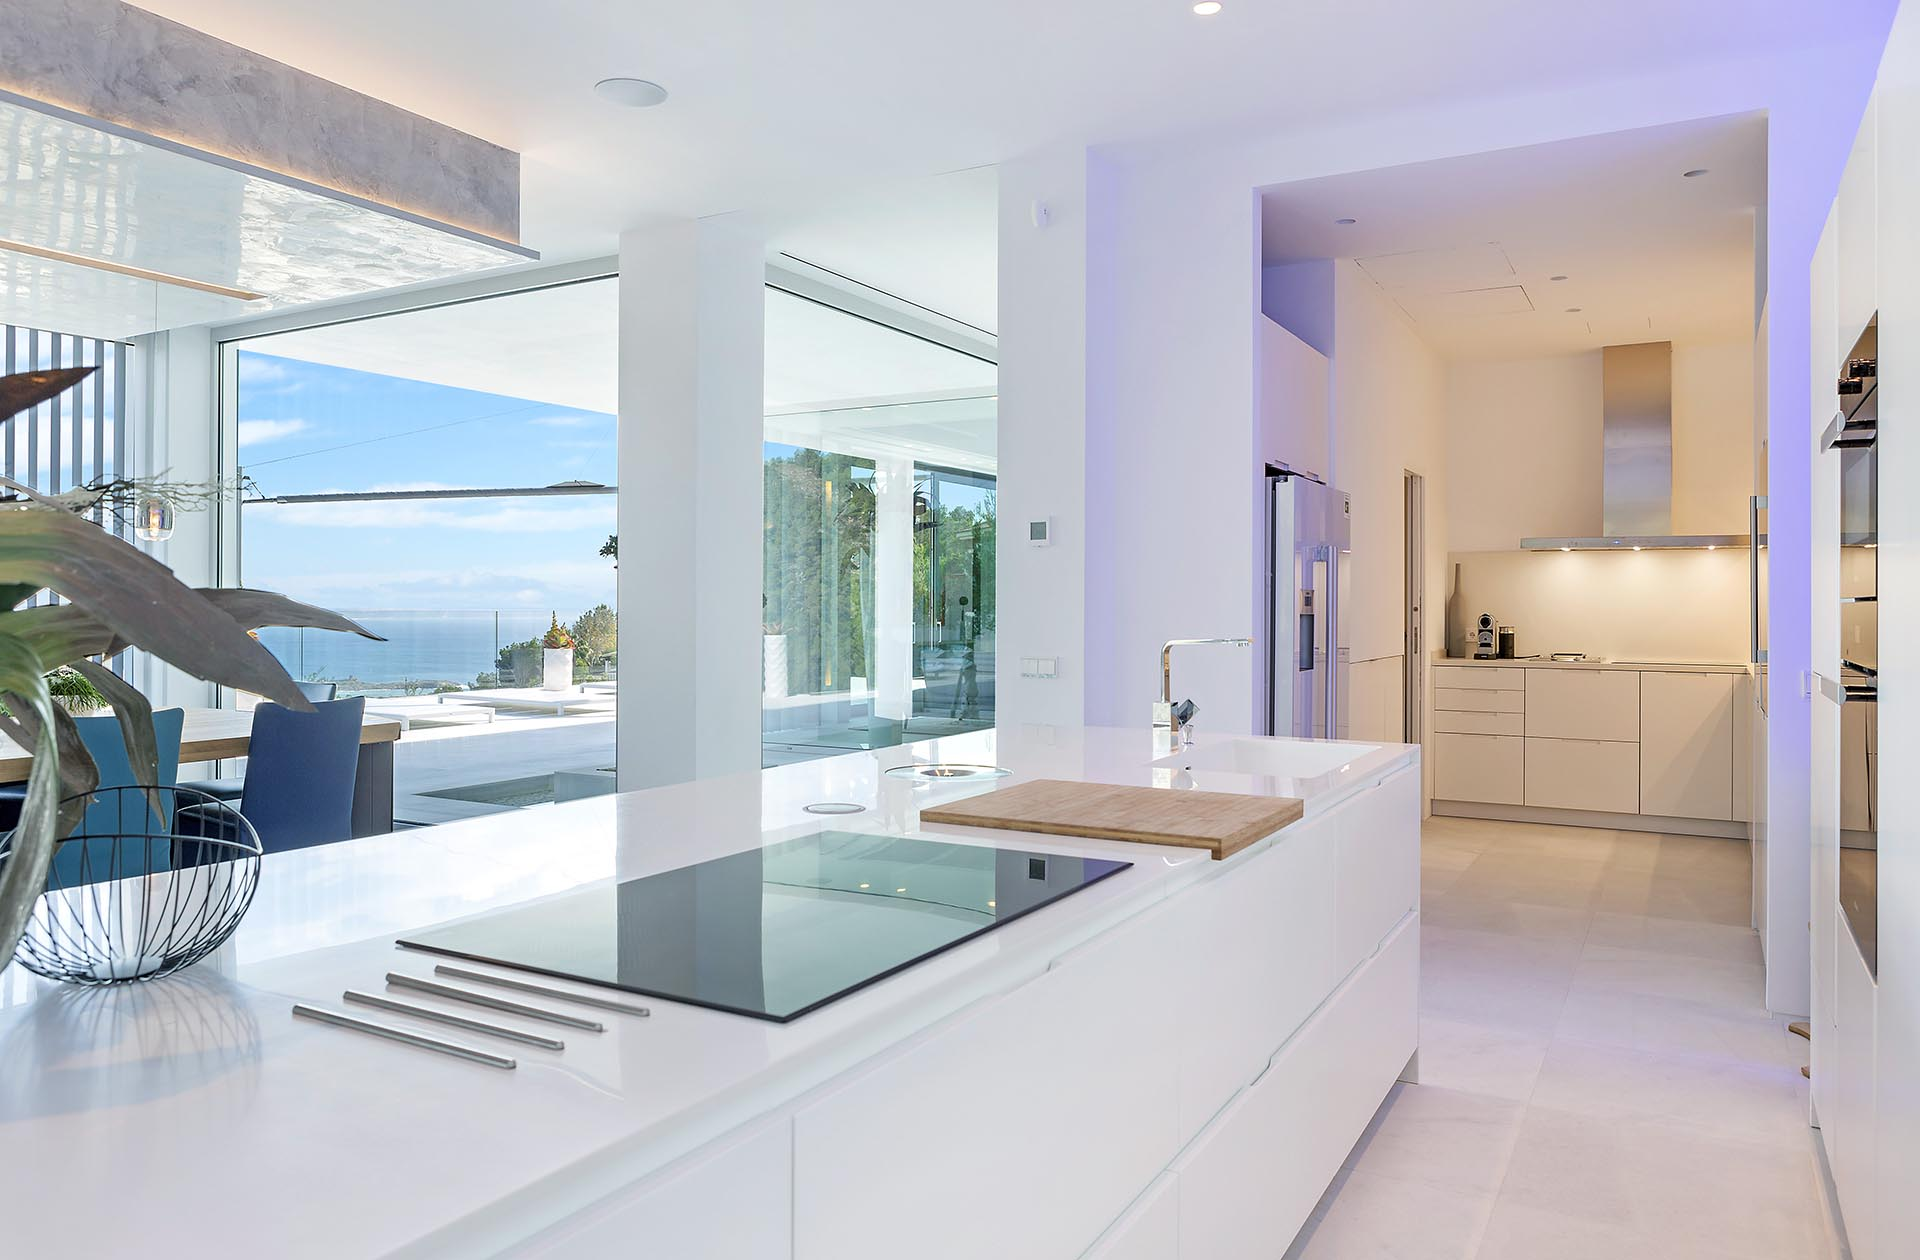 Beautiful modern villa in Costa den Blanes - High ceilings